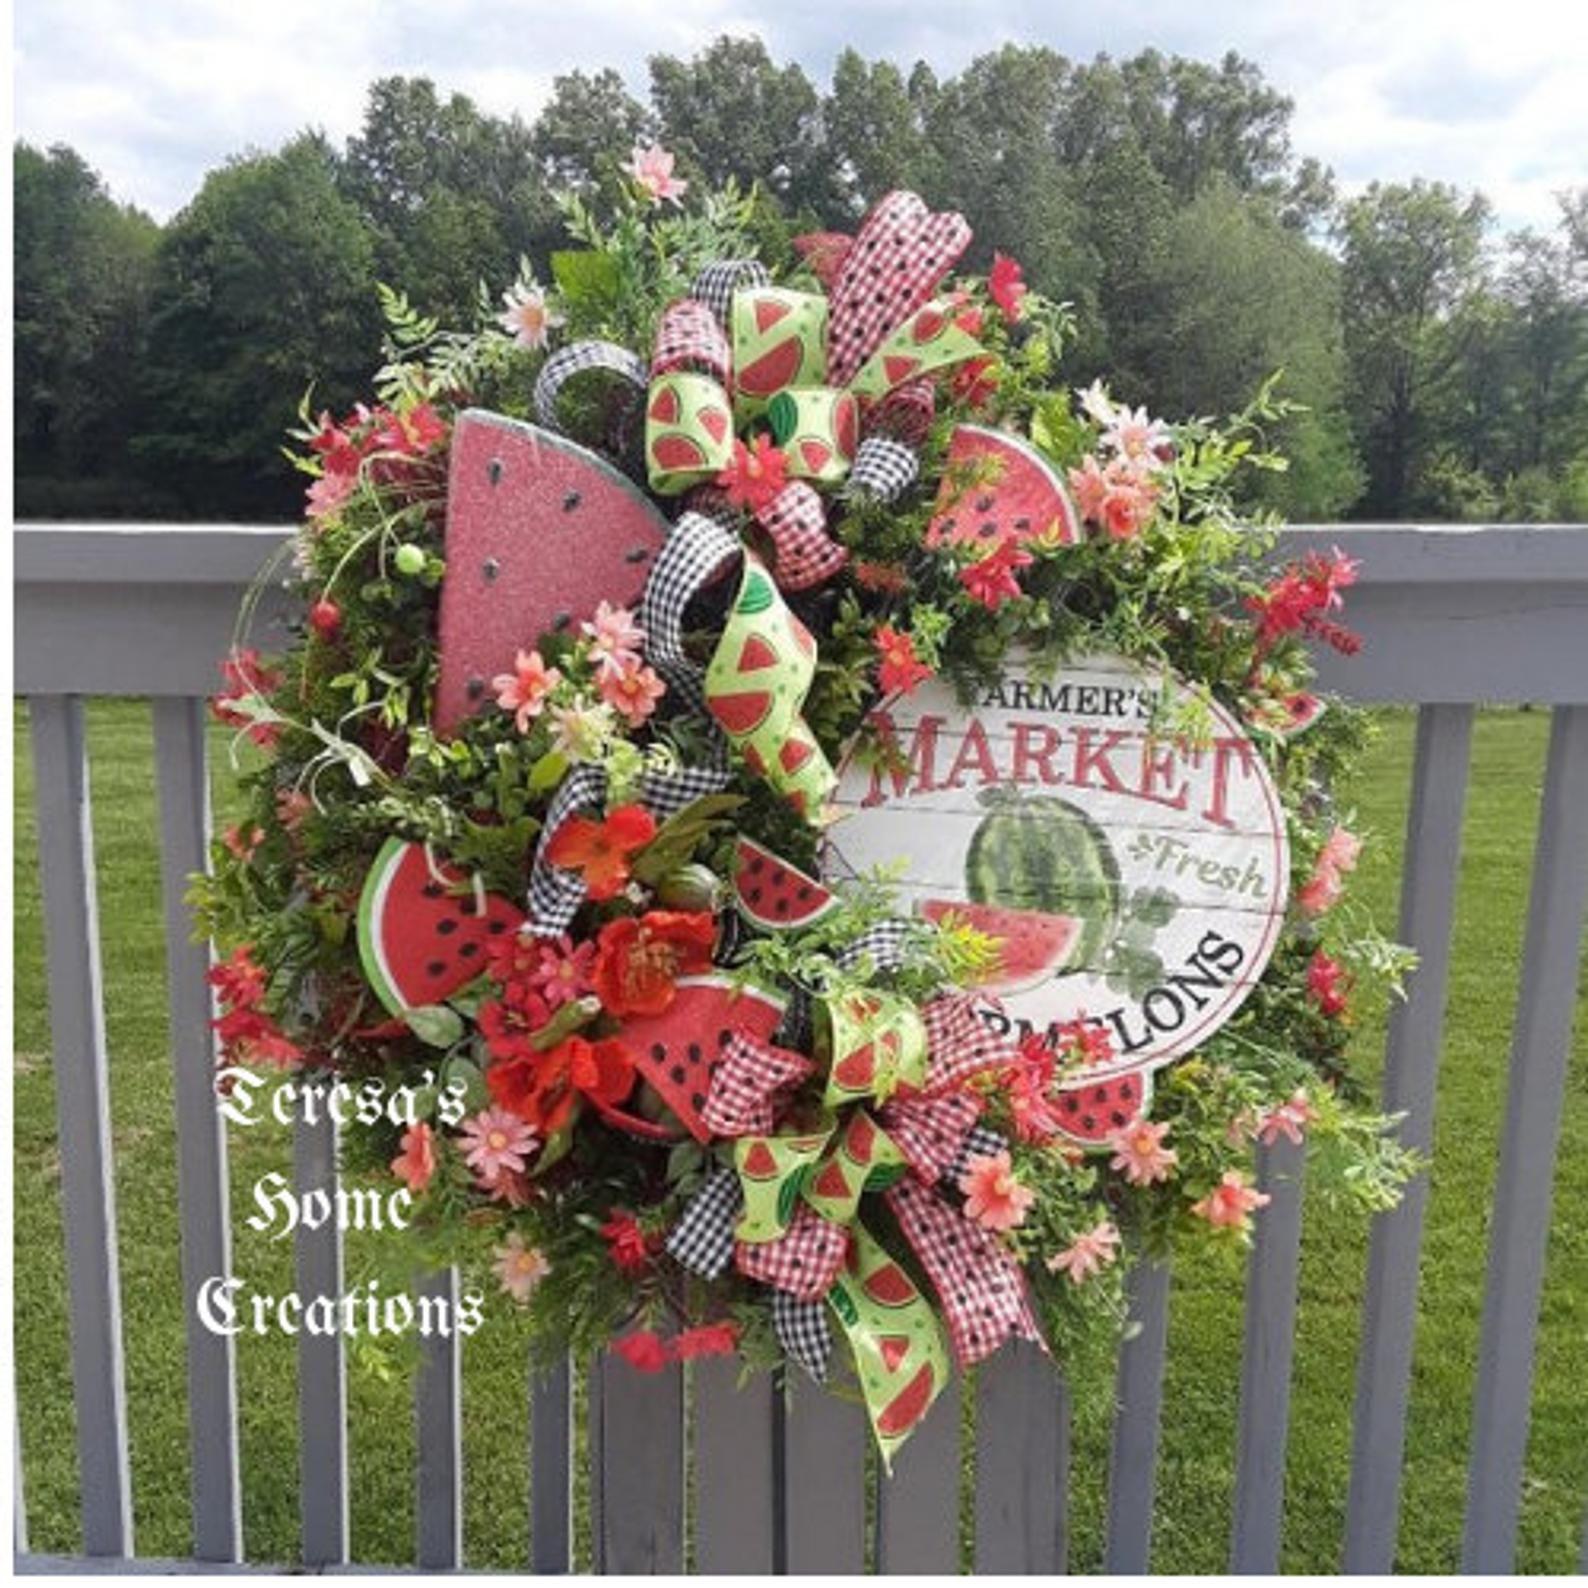 Photo of Large Summer Wreath, Watermelon Wreath, Farmhouse Wreaths, Summer Wreaths, Watermelon Decor, Front Door Wreath, Farmhouse Mesh Wreath